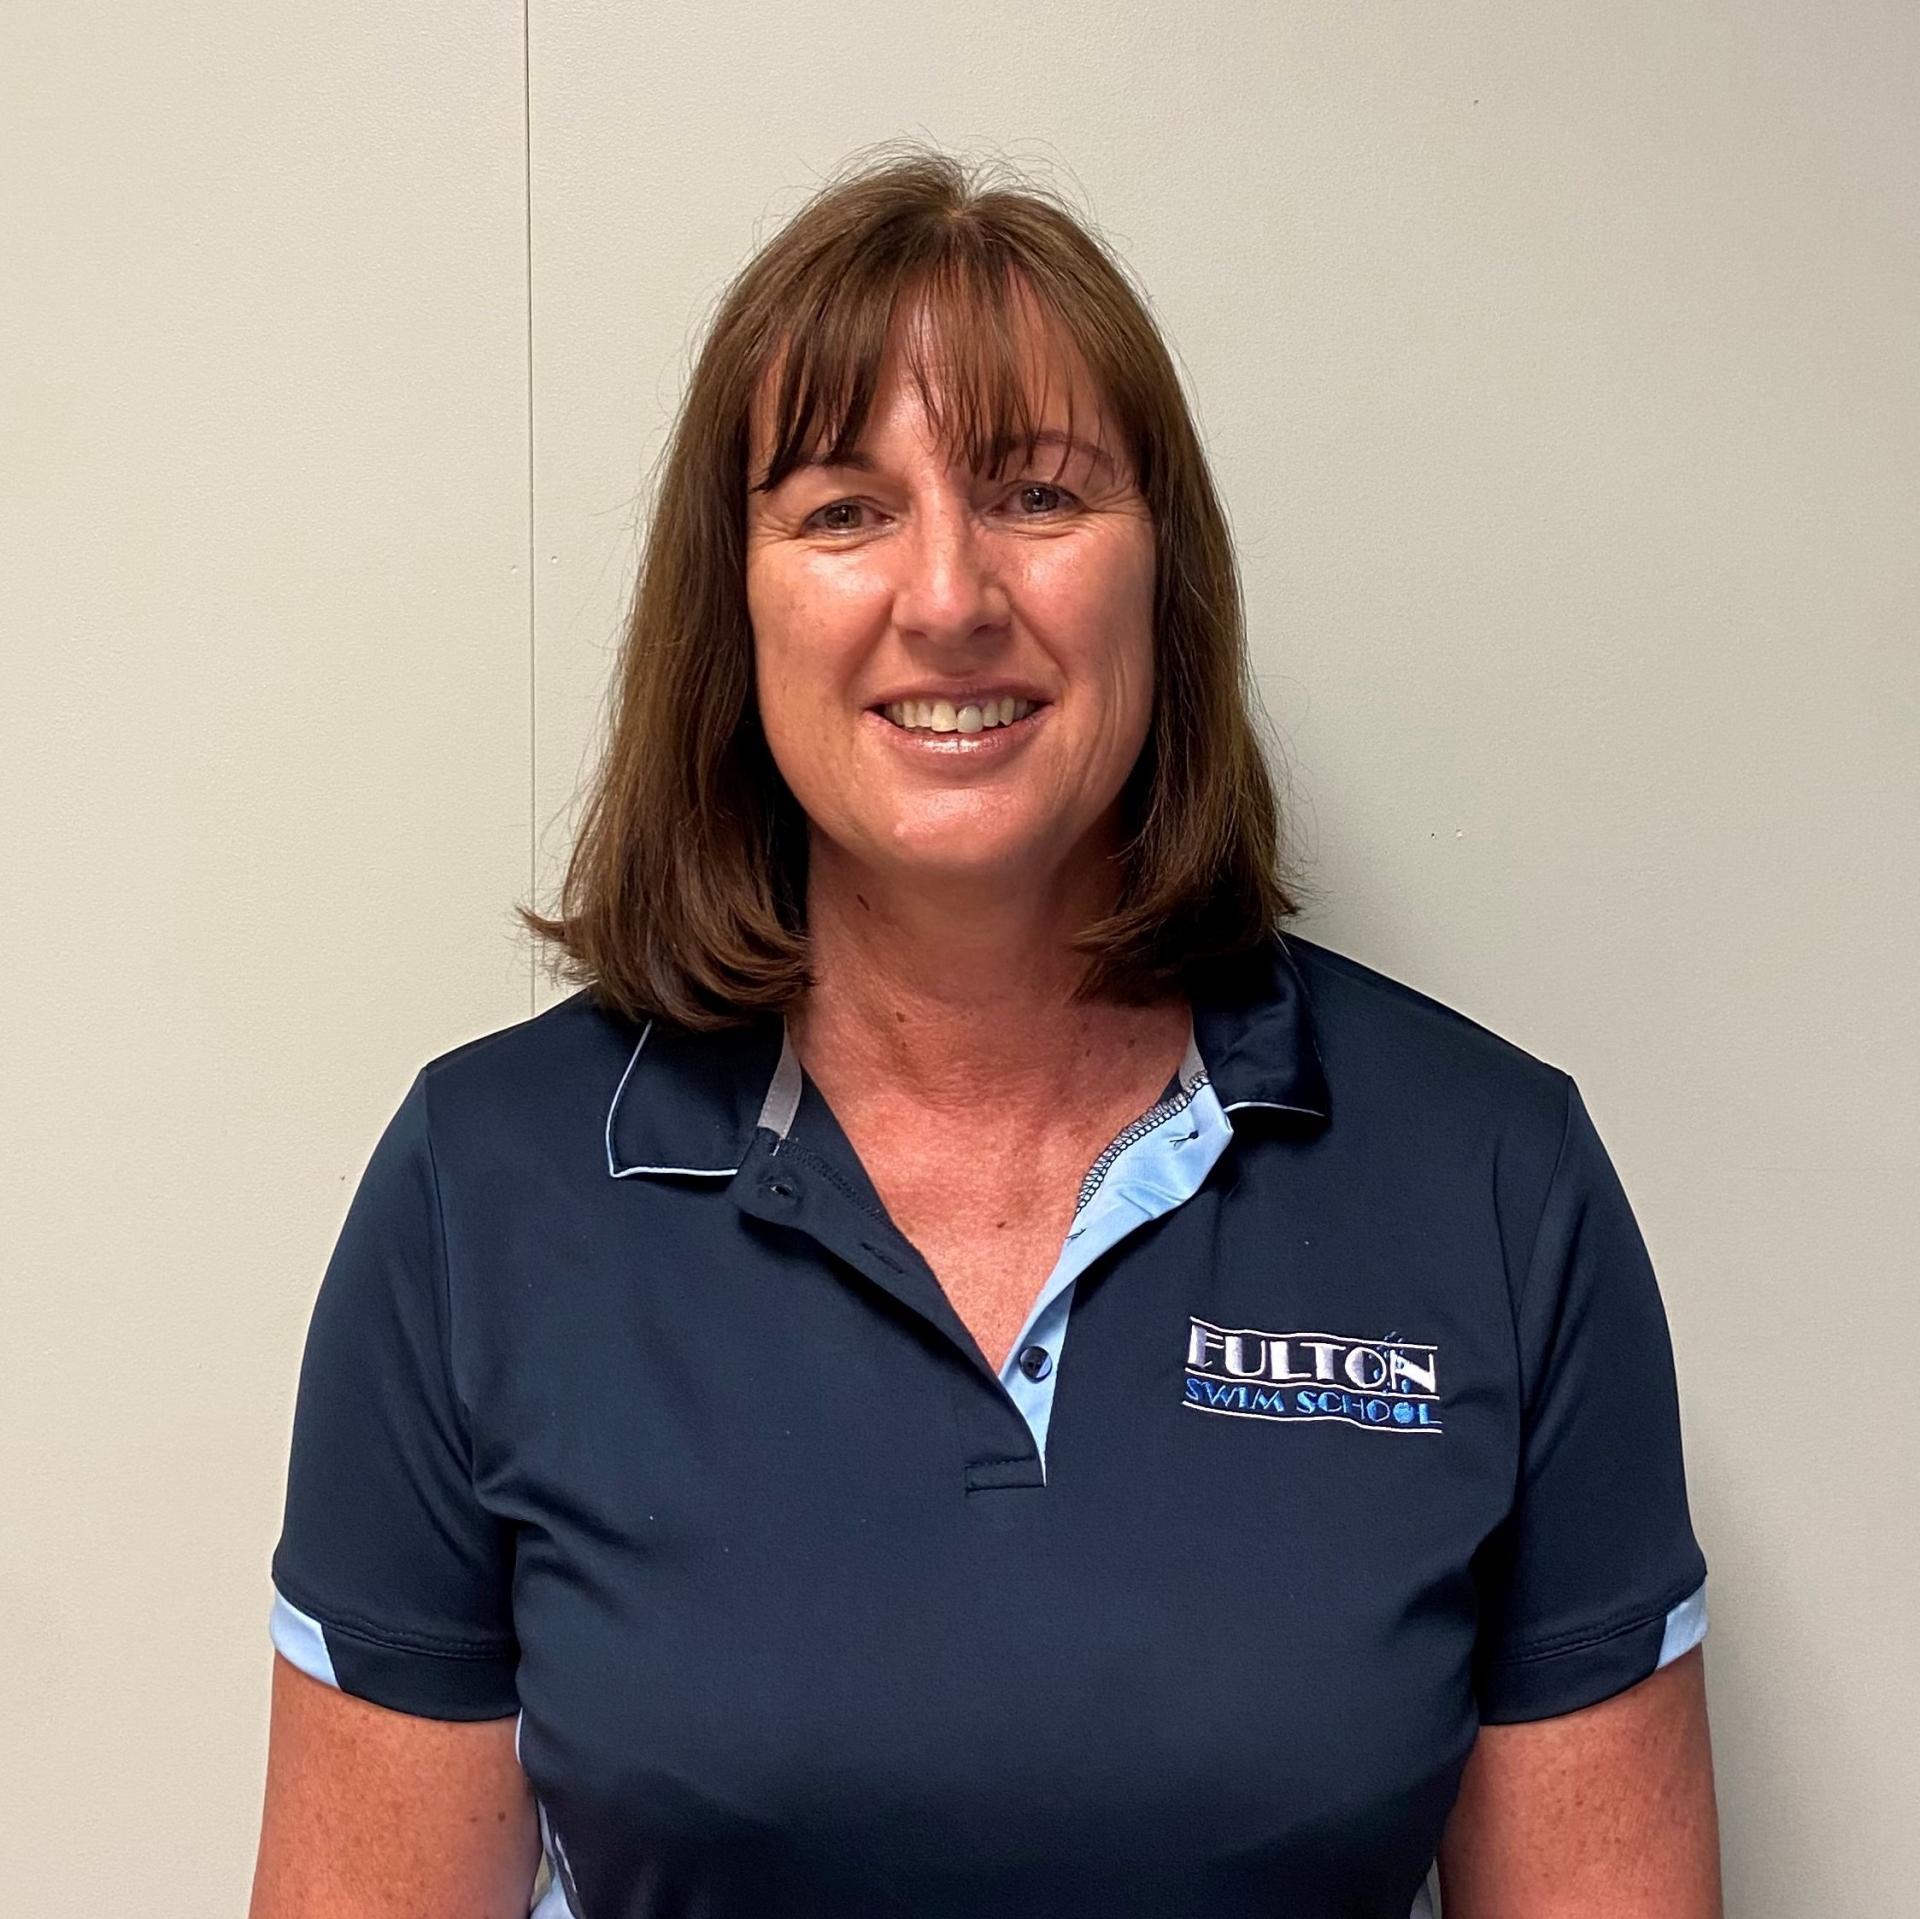 Donna - Fulton Swim School Teacher